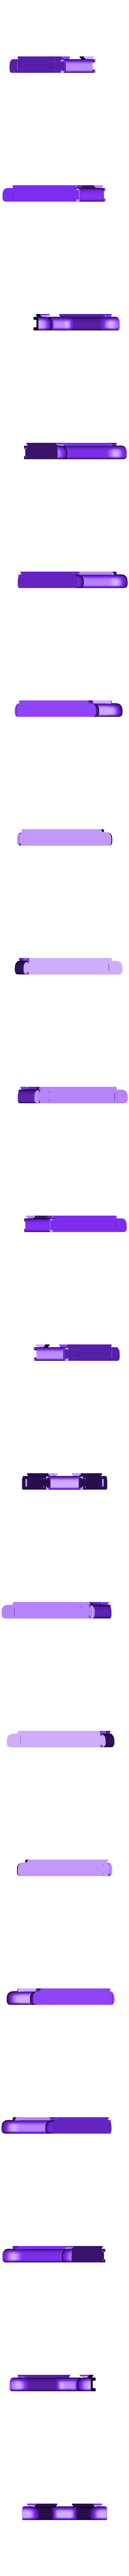 SOPORTEJOYTICKSWITCH bycastledesignchile.stl Download free STL file Support control joycon nintendo switch • 3D printer model, CastleDesignChile